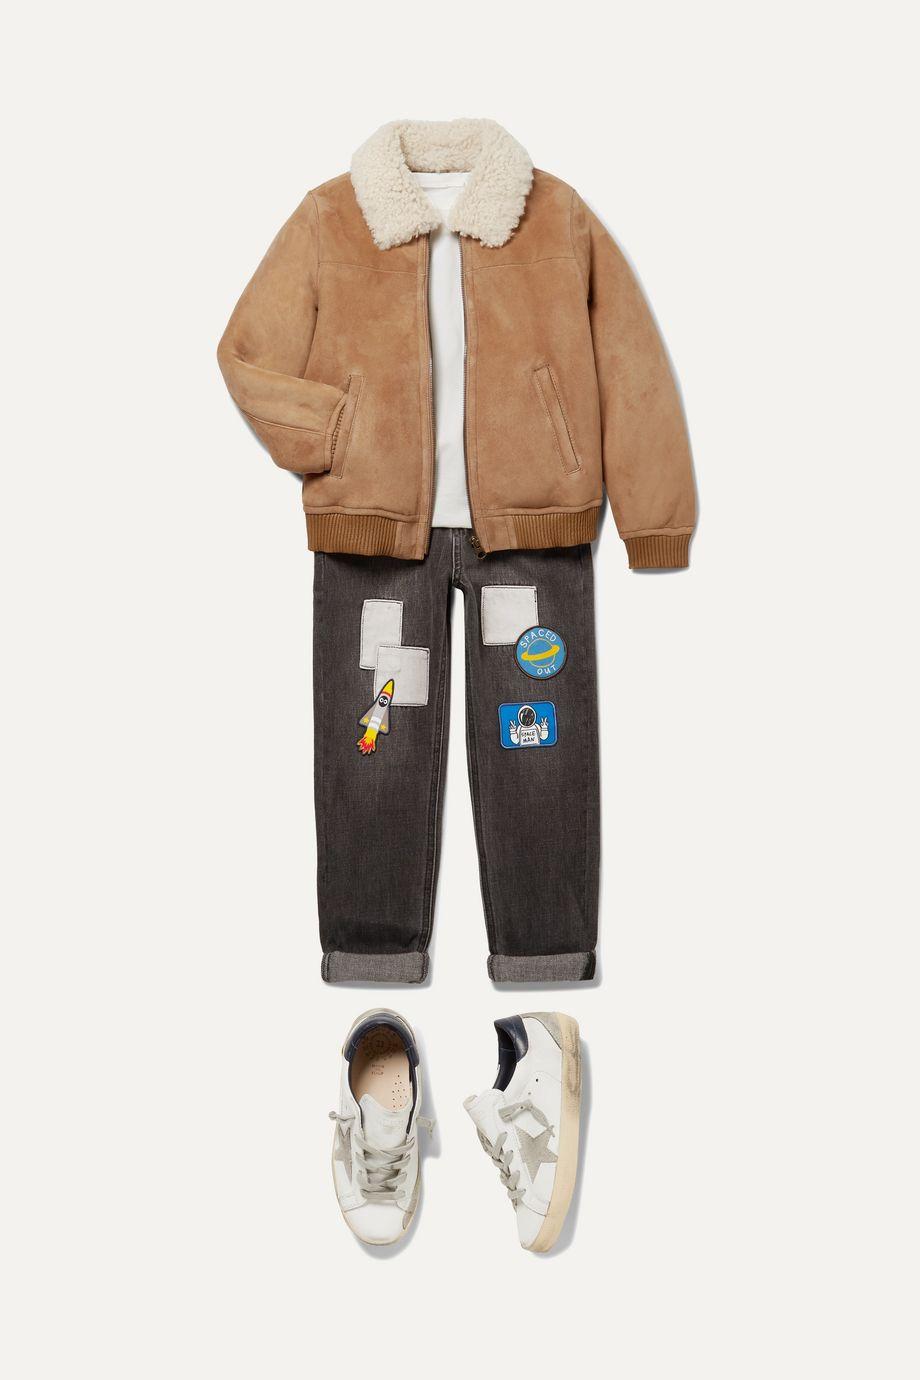 Yves Salomon Kids 【8 - 10 岁】羊毛皮边饰绒面革飞行员夹克